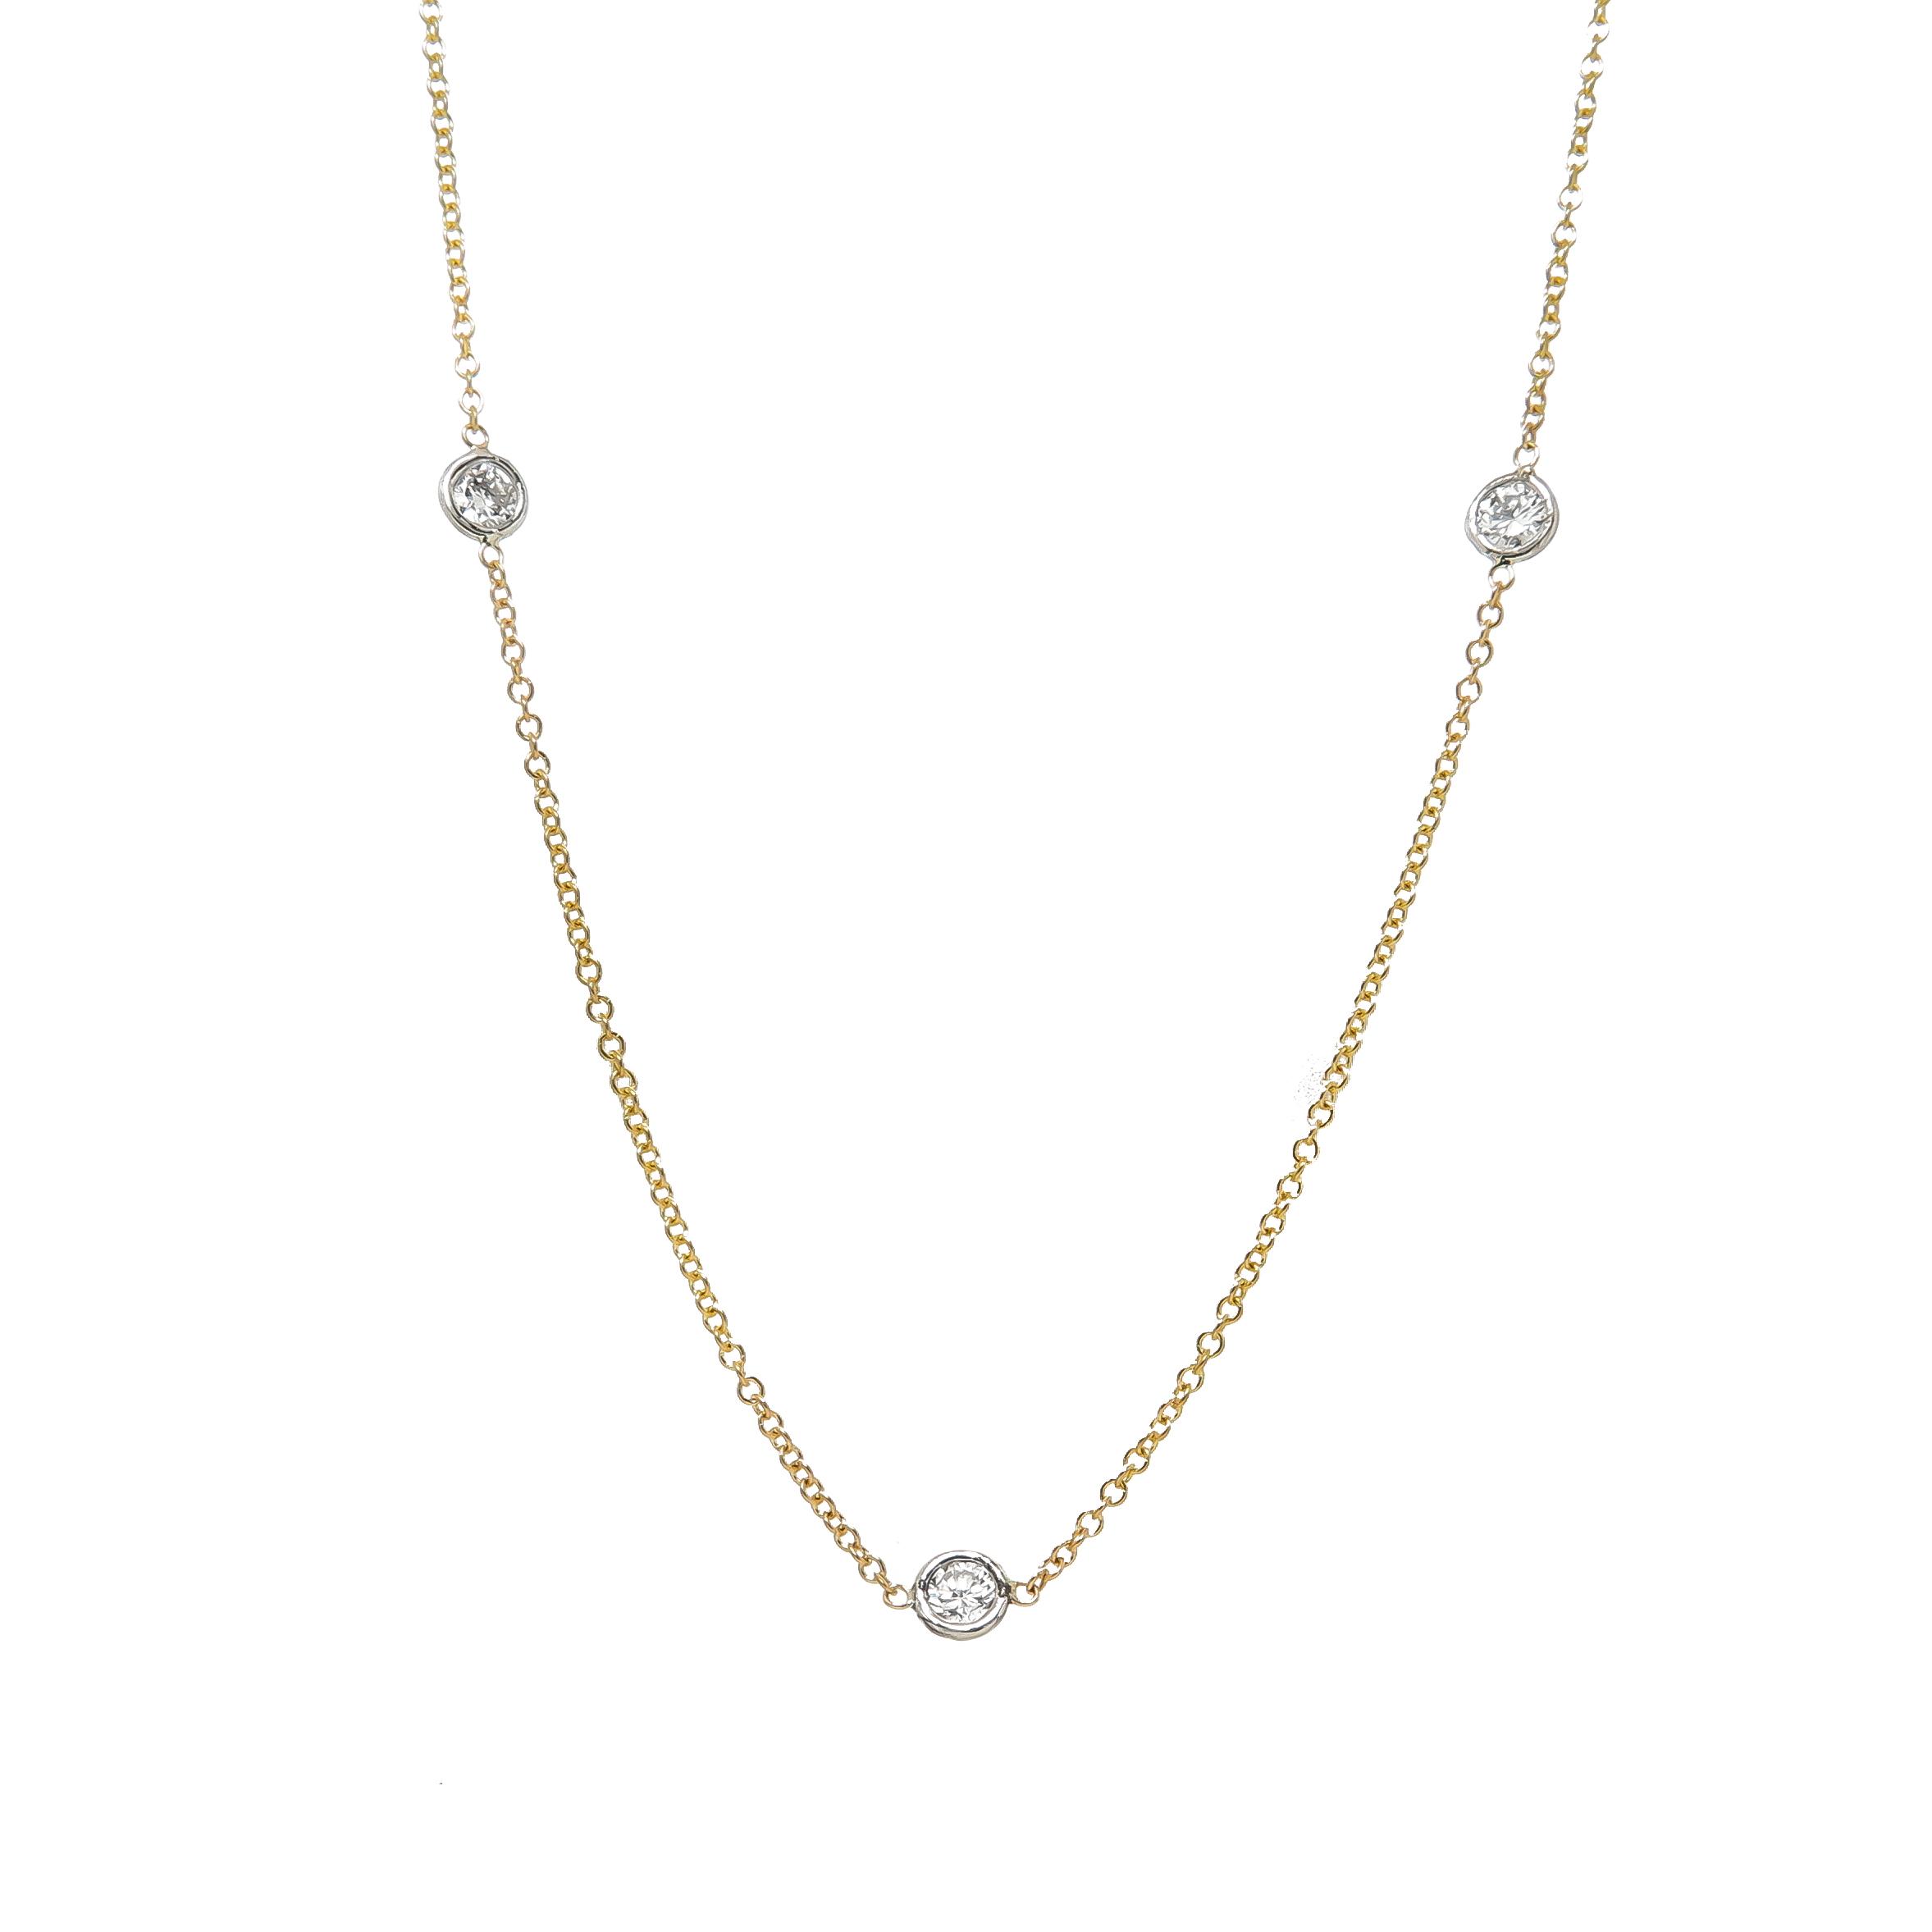 kerry gilligan 3 diamond necklace.jpg